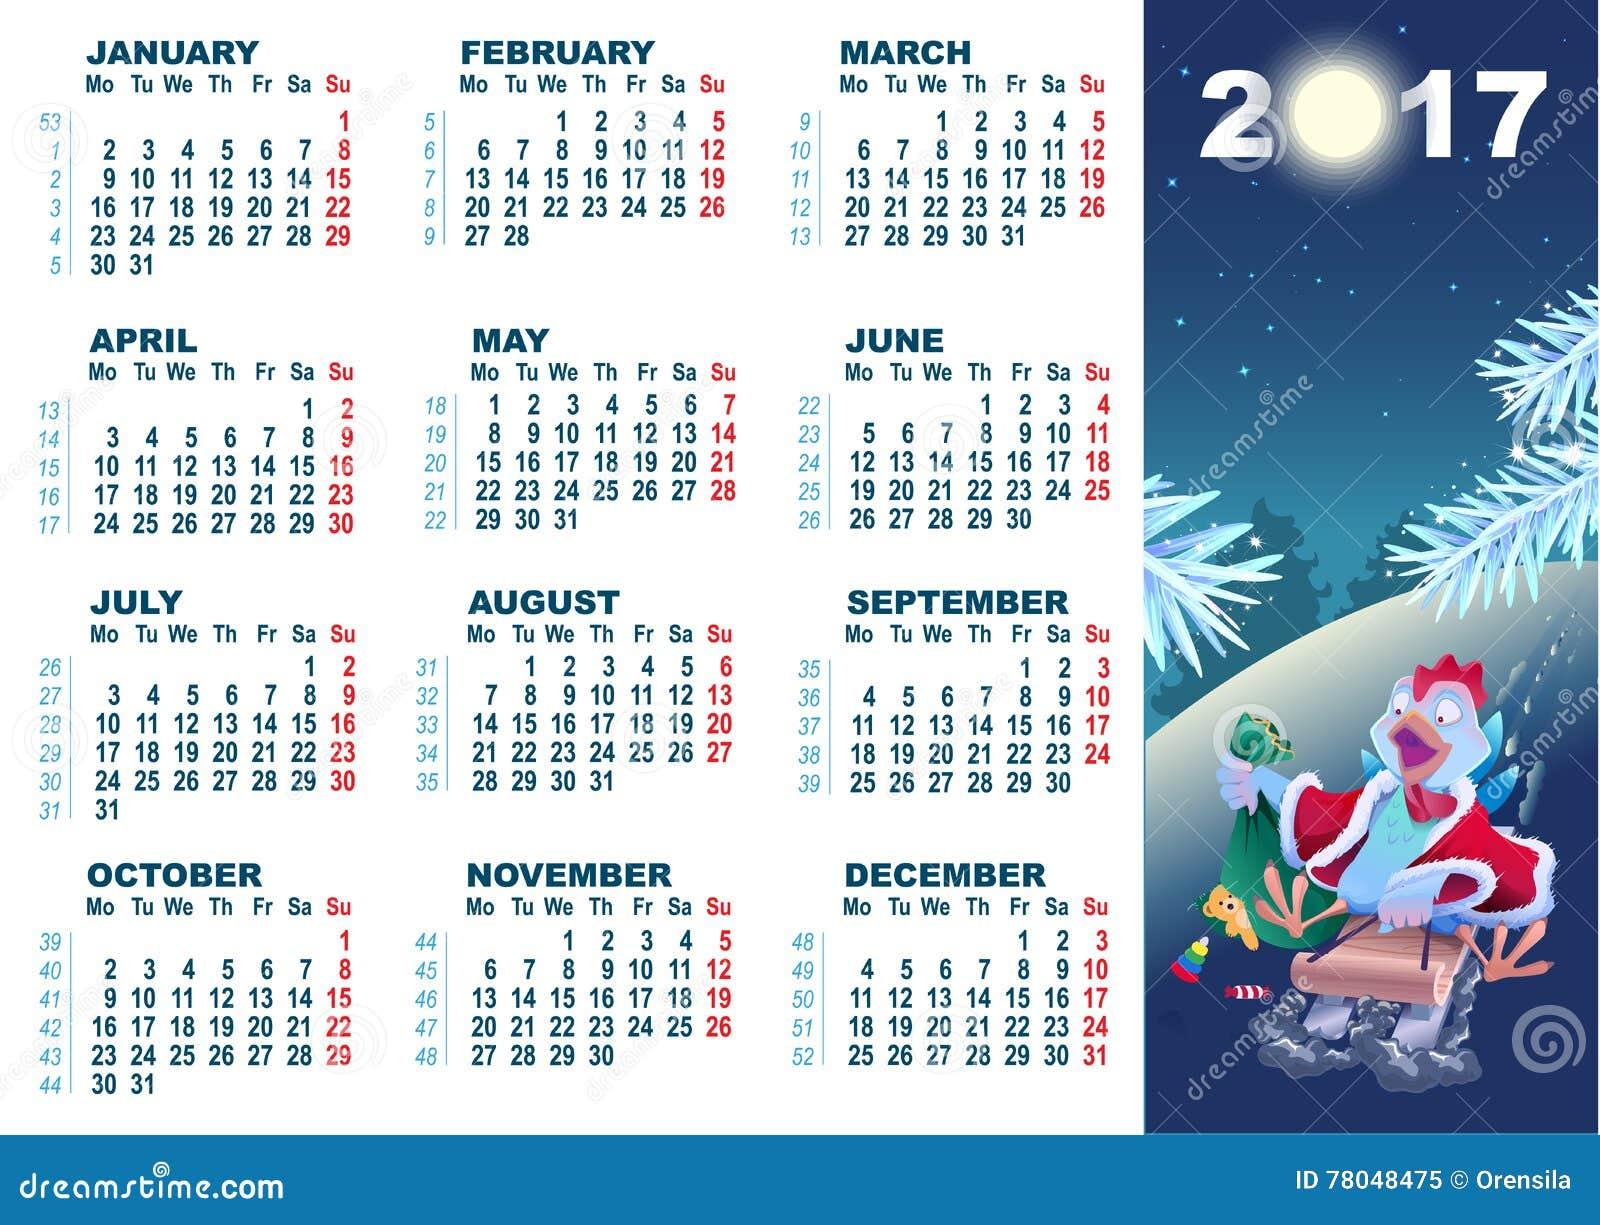 azul calendario gallo historieta navidad